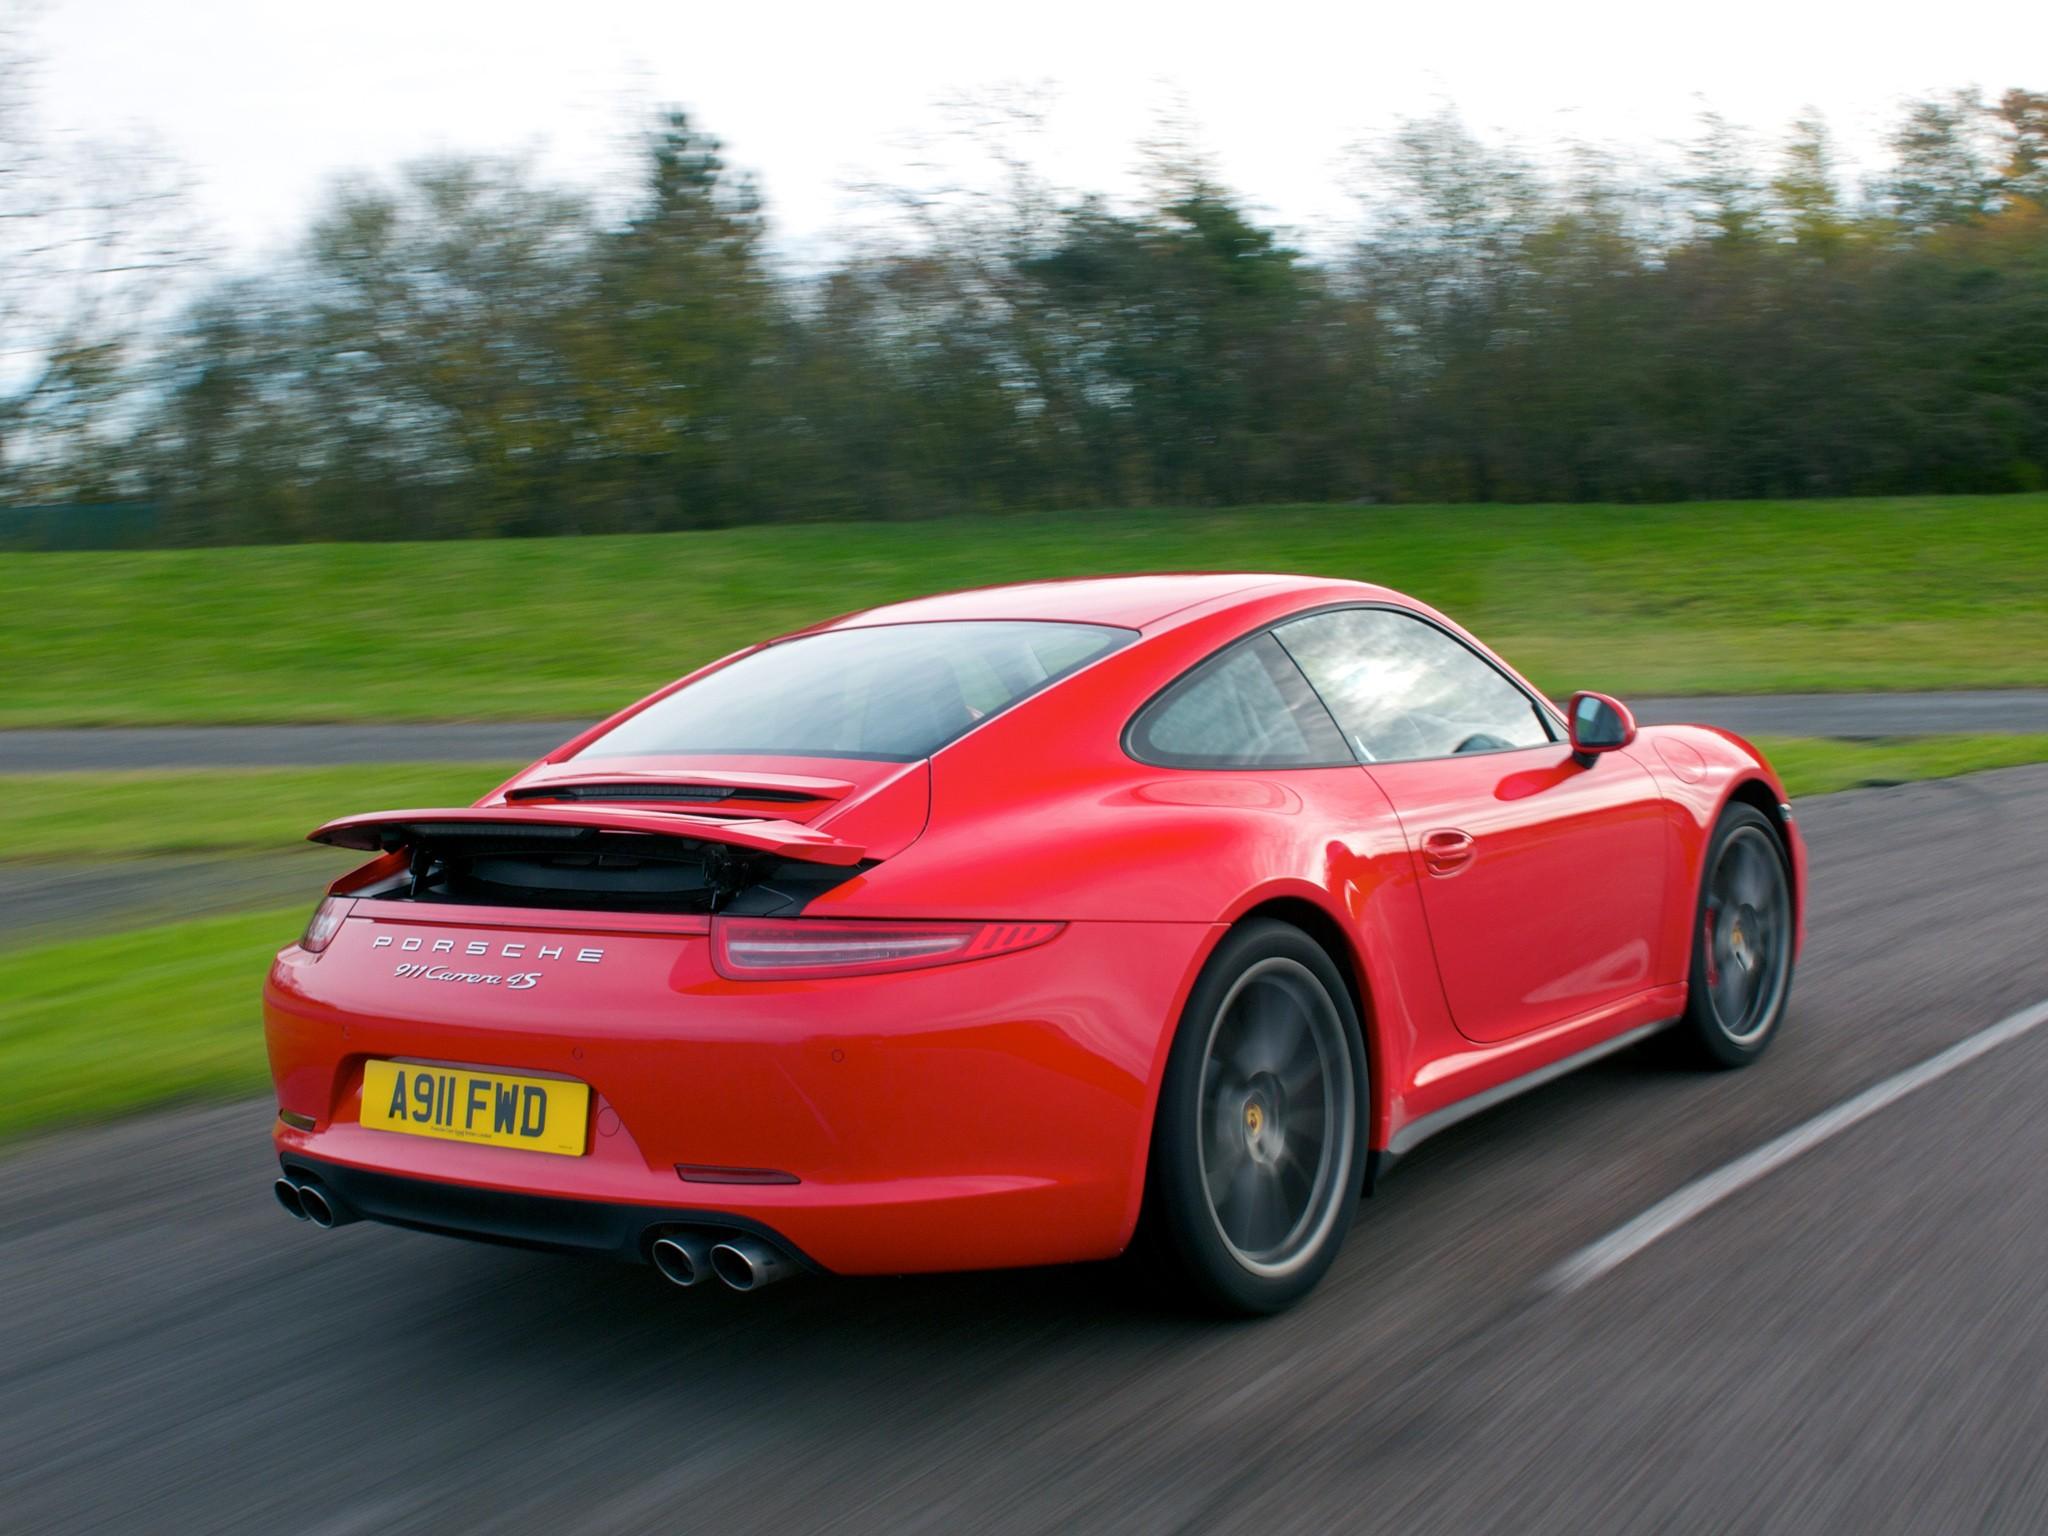 porsche 911 carrera 4s (991) specs - 2012, 2013, 2014, 2015, 2016